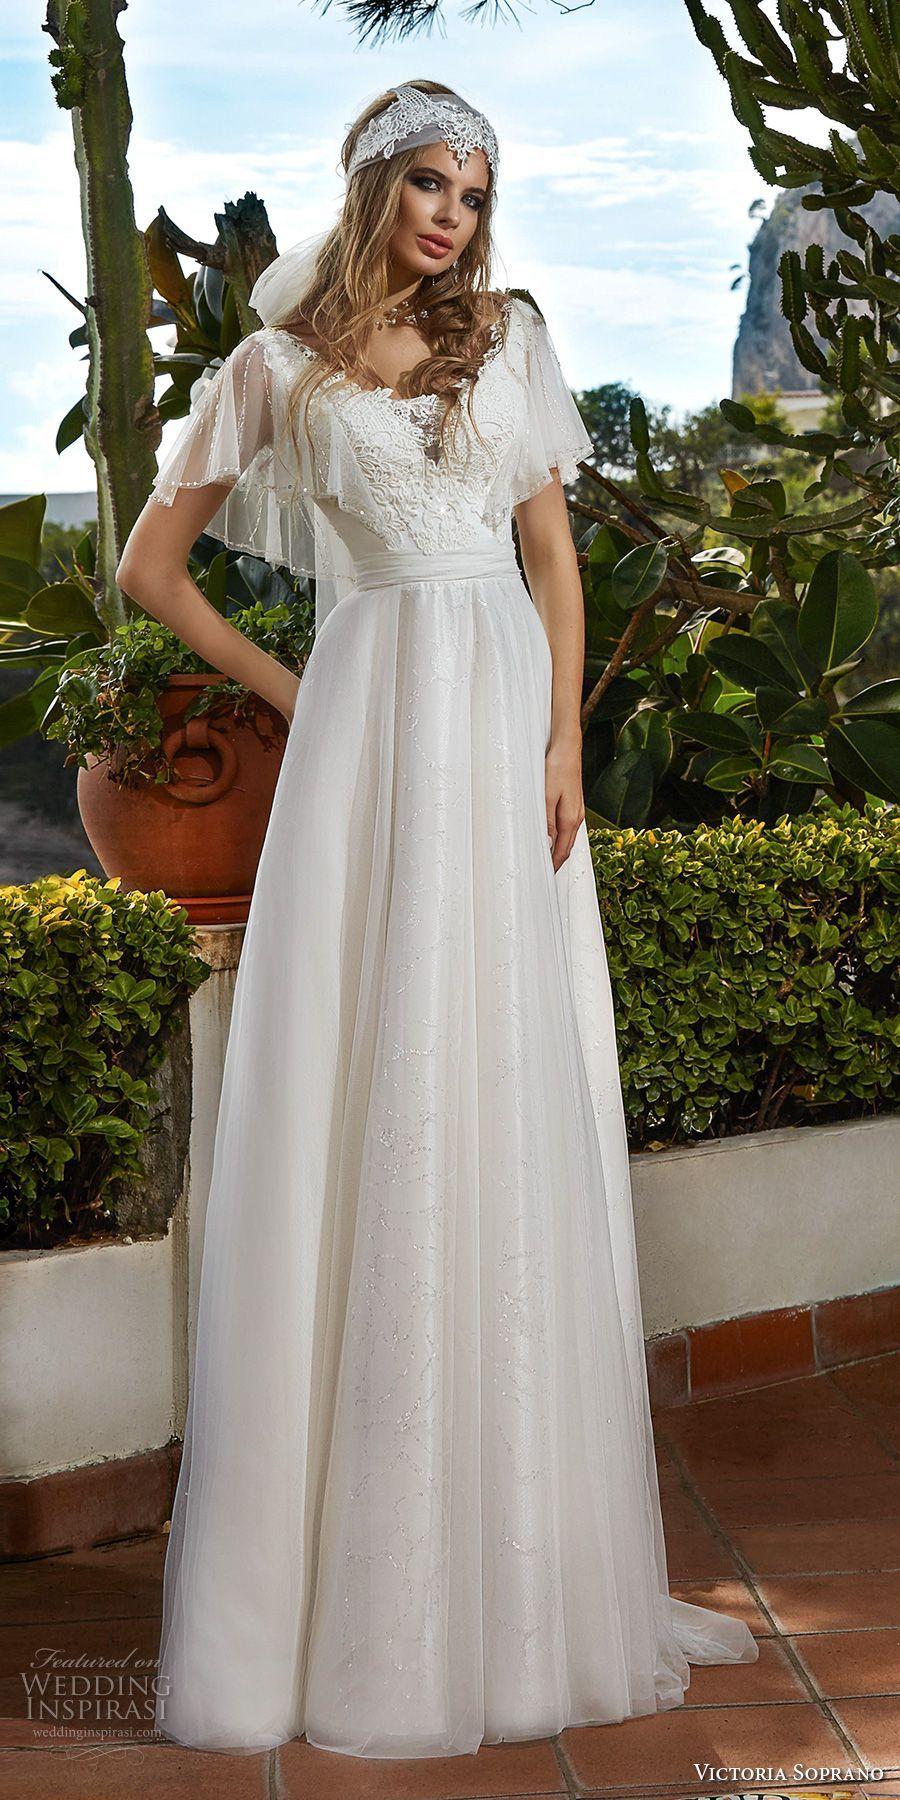 Victoria soprano wedding dresses u uccapriud bridal collection